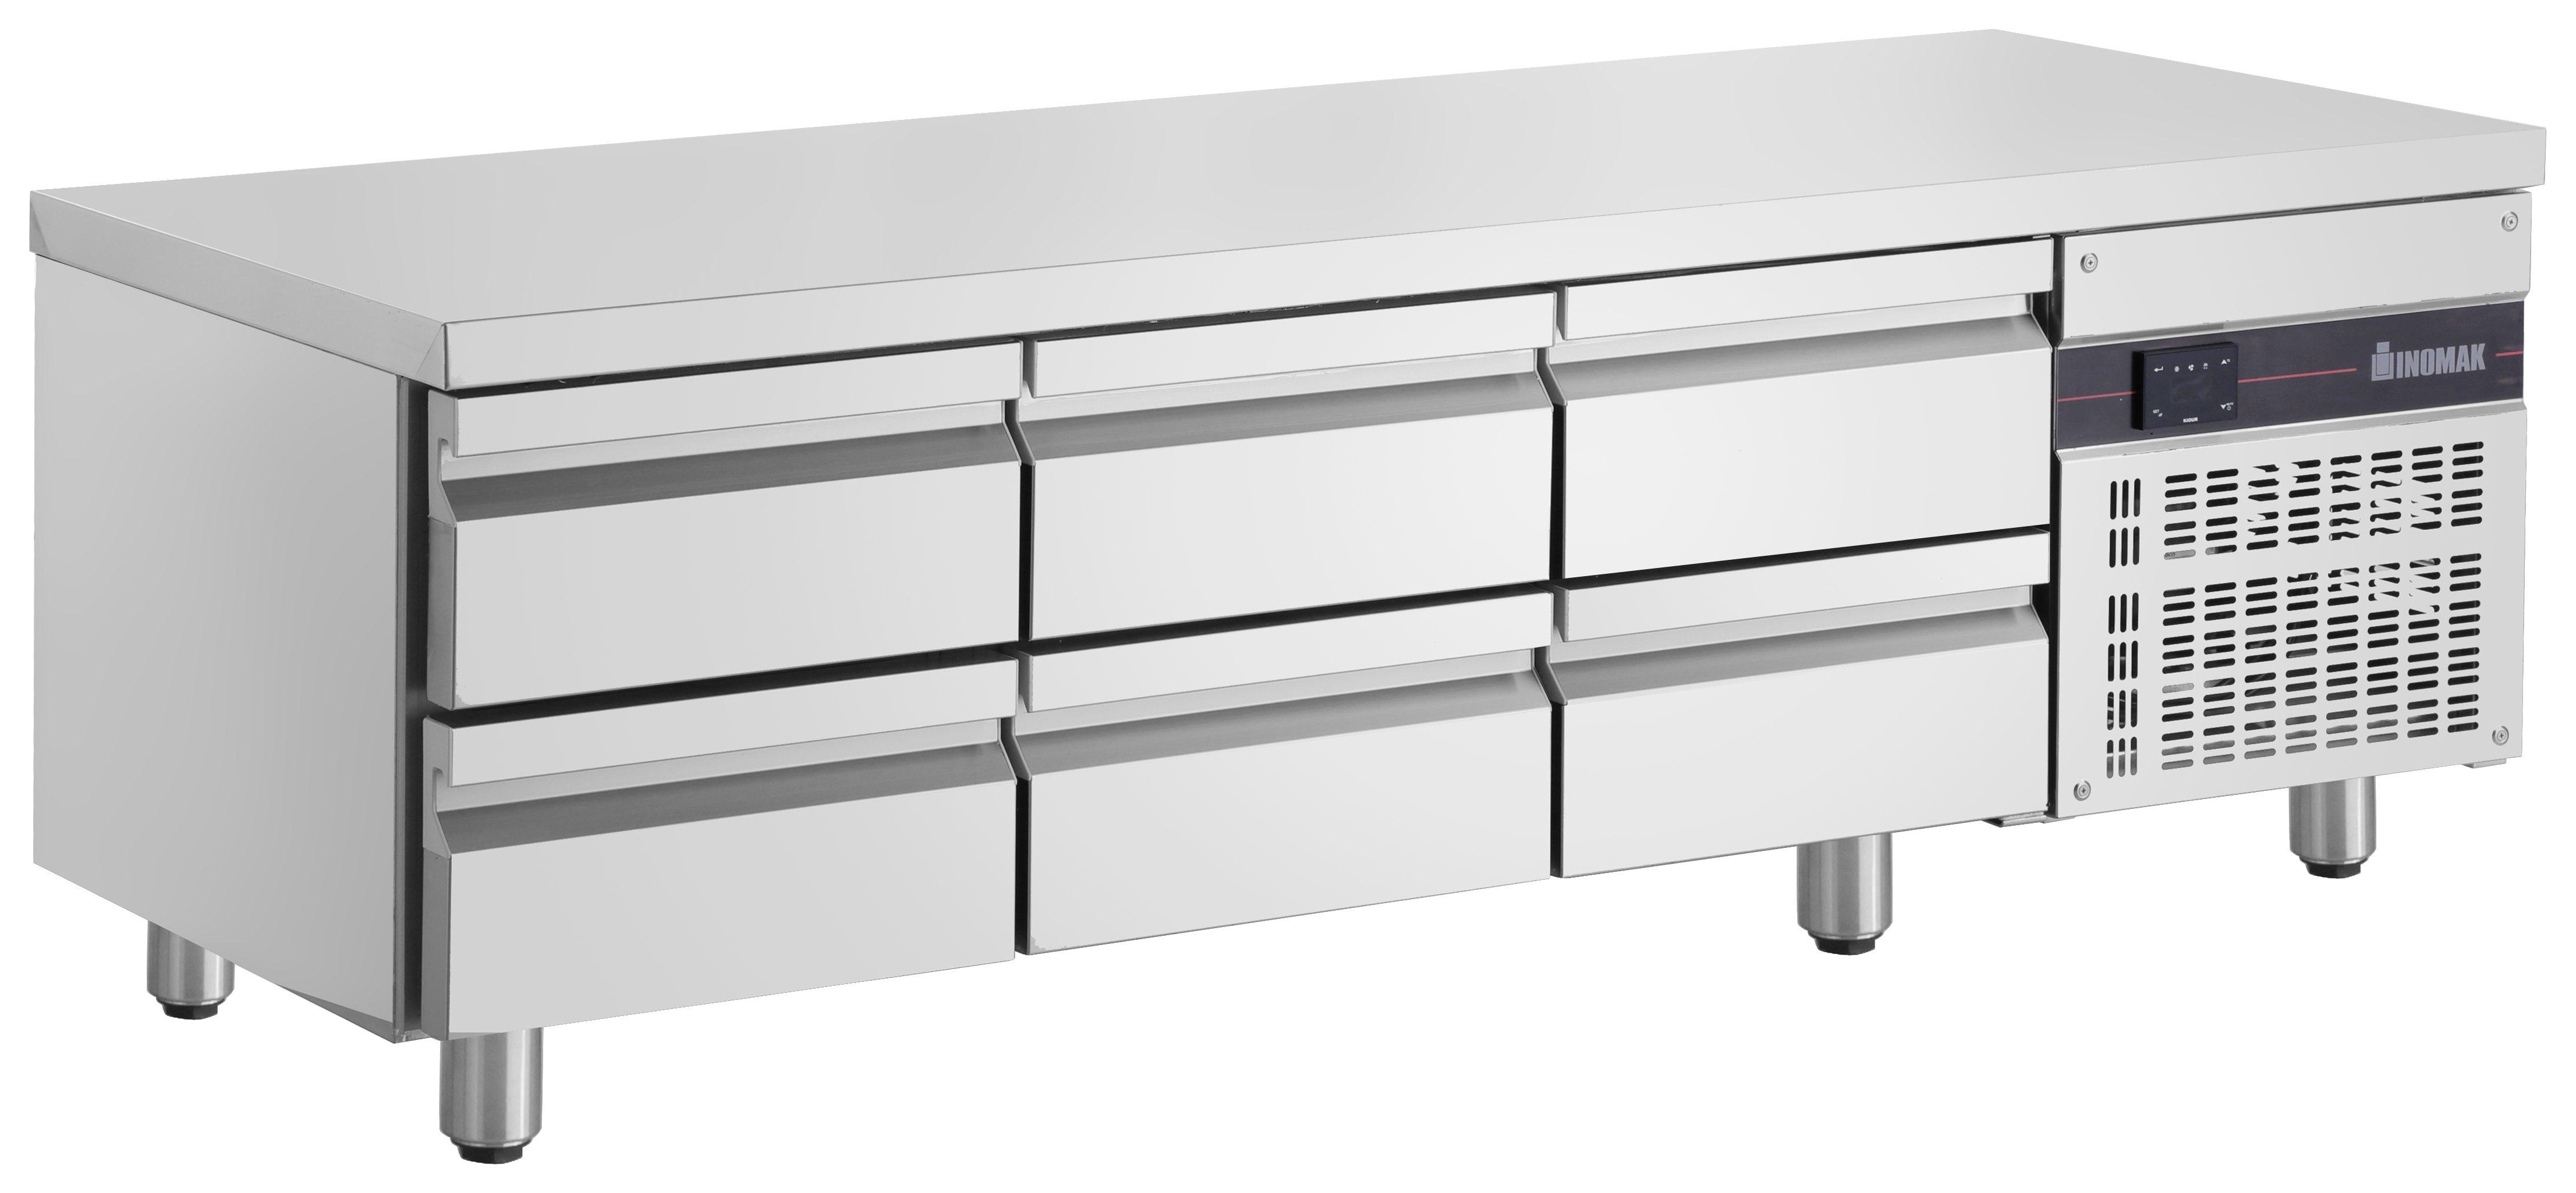 Lowboy refrigerator drawer